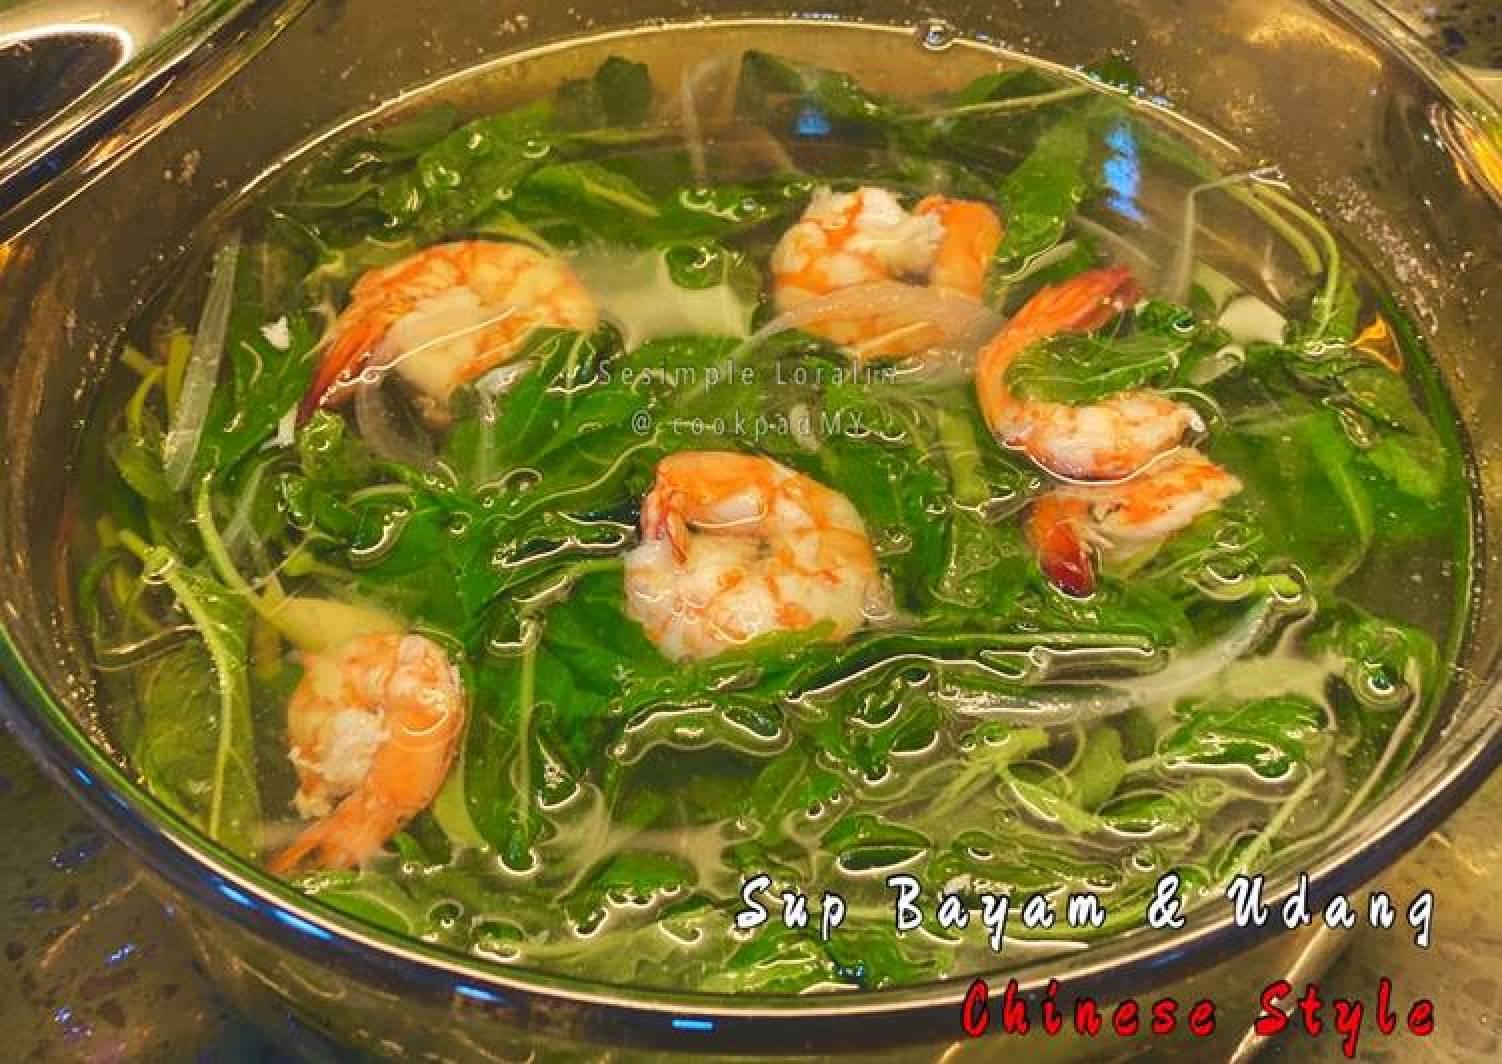 Sup Udang Dan Bayam Sup Sihat Eat Clean Rahsia Resepi Sedap Resepi Masakan Viral